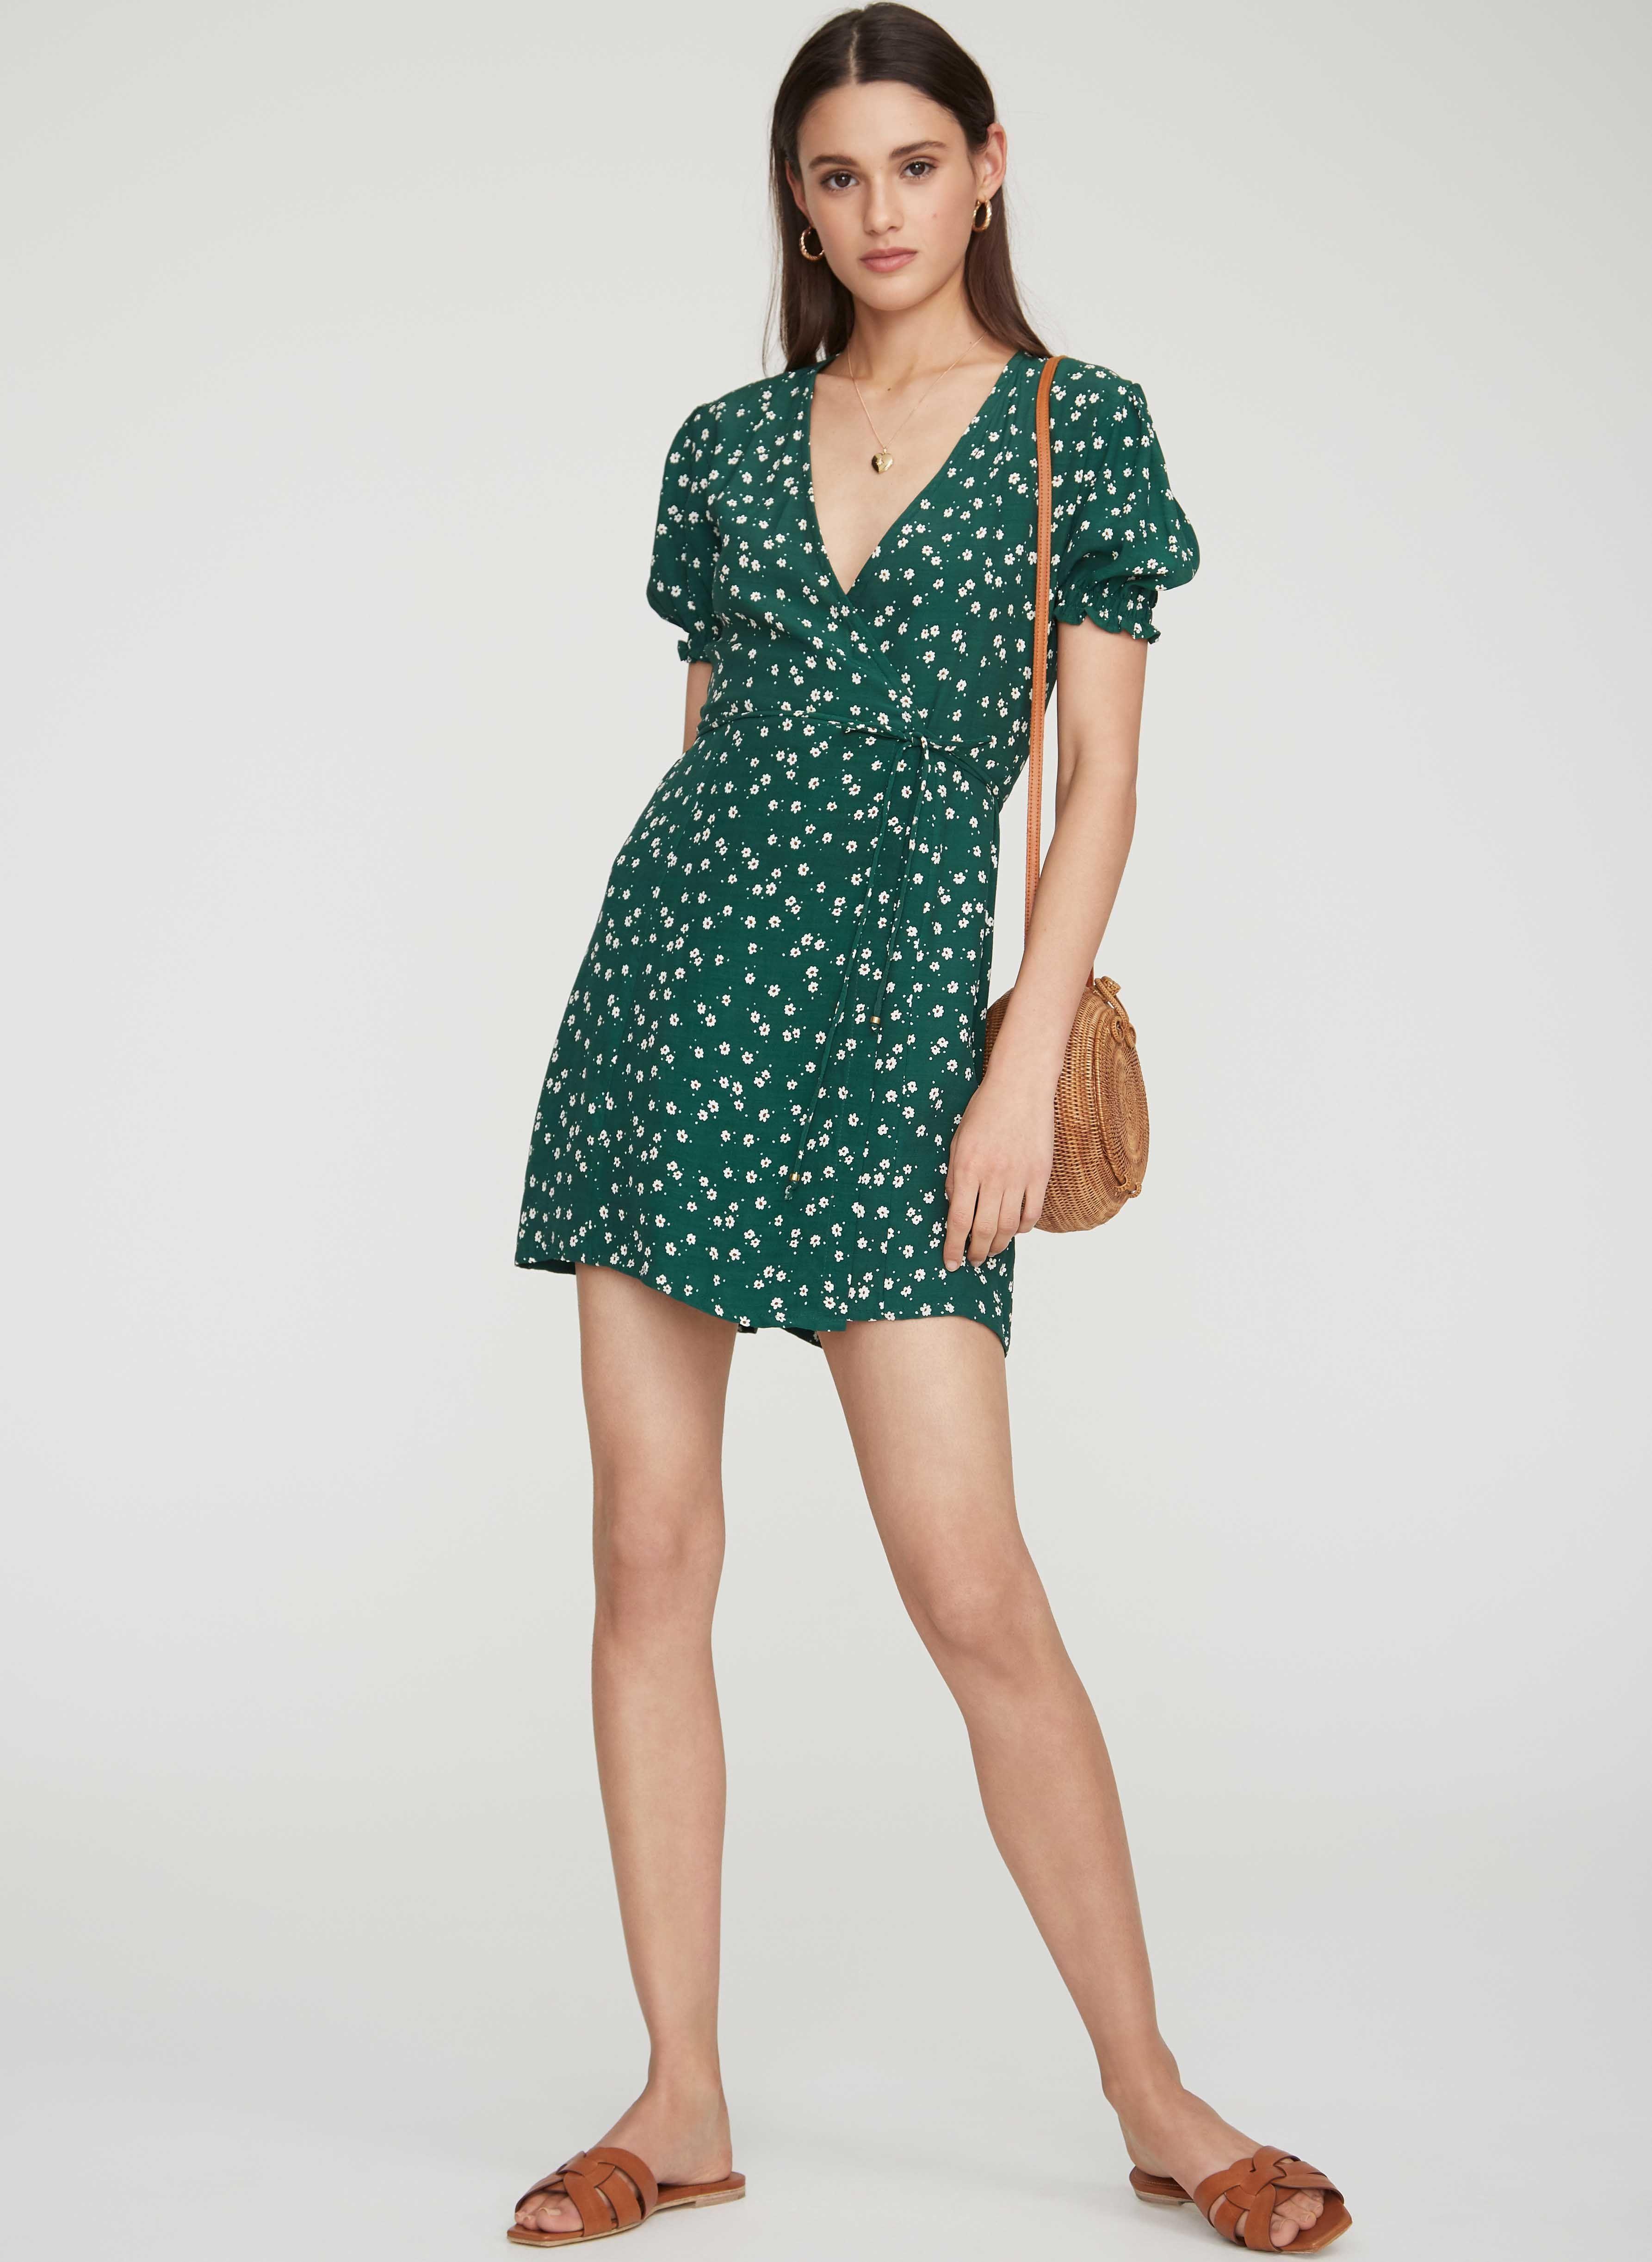 4f4d764abc0 Betina floral print - green - mira dress in 2019